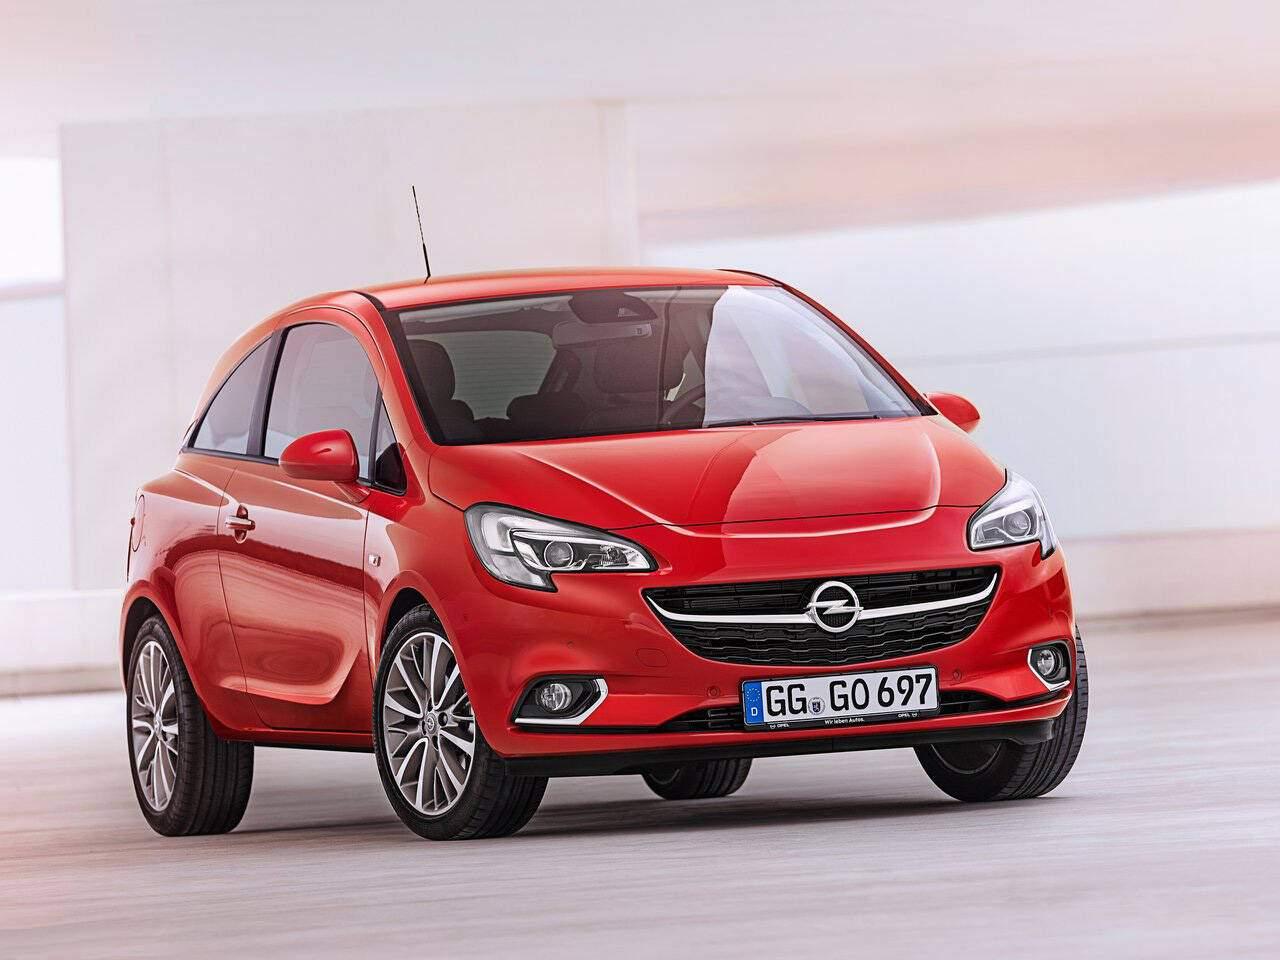 Opel Corsa V 1.2 (2014),  ajouté par fox58